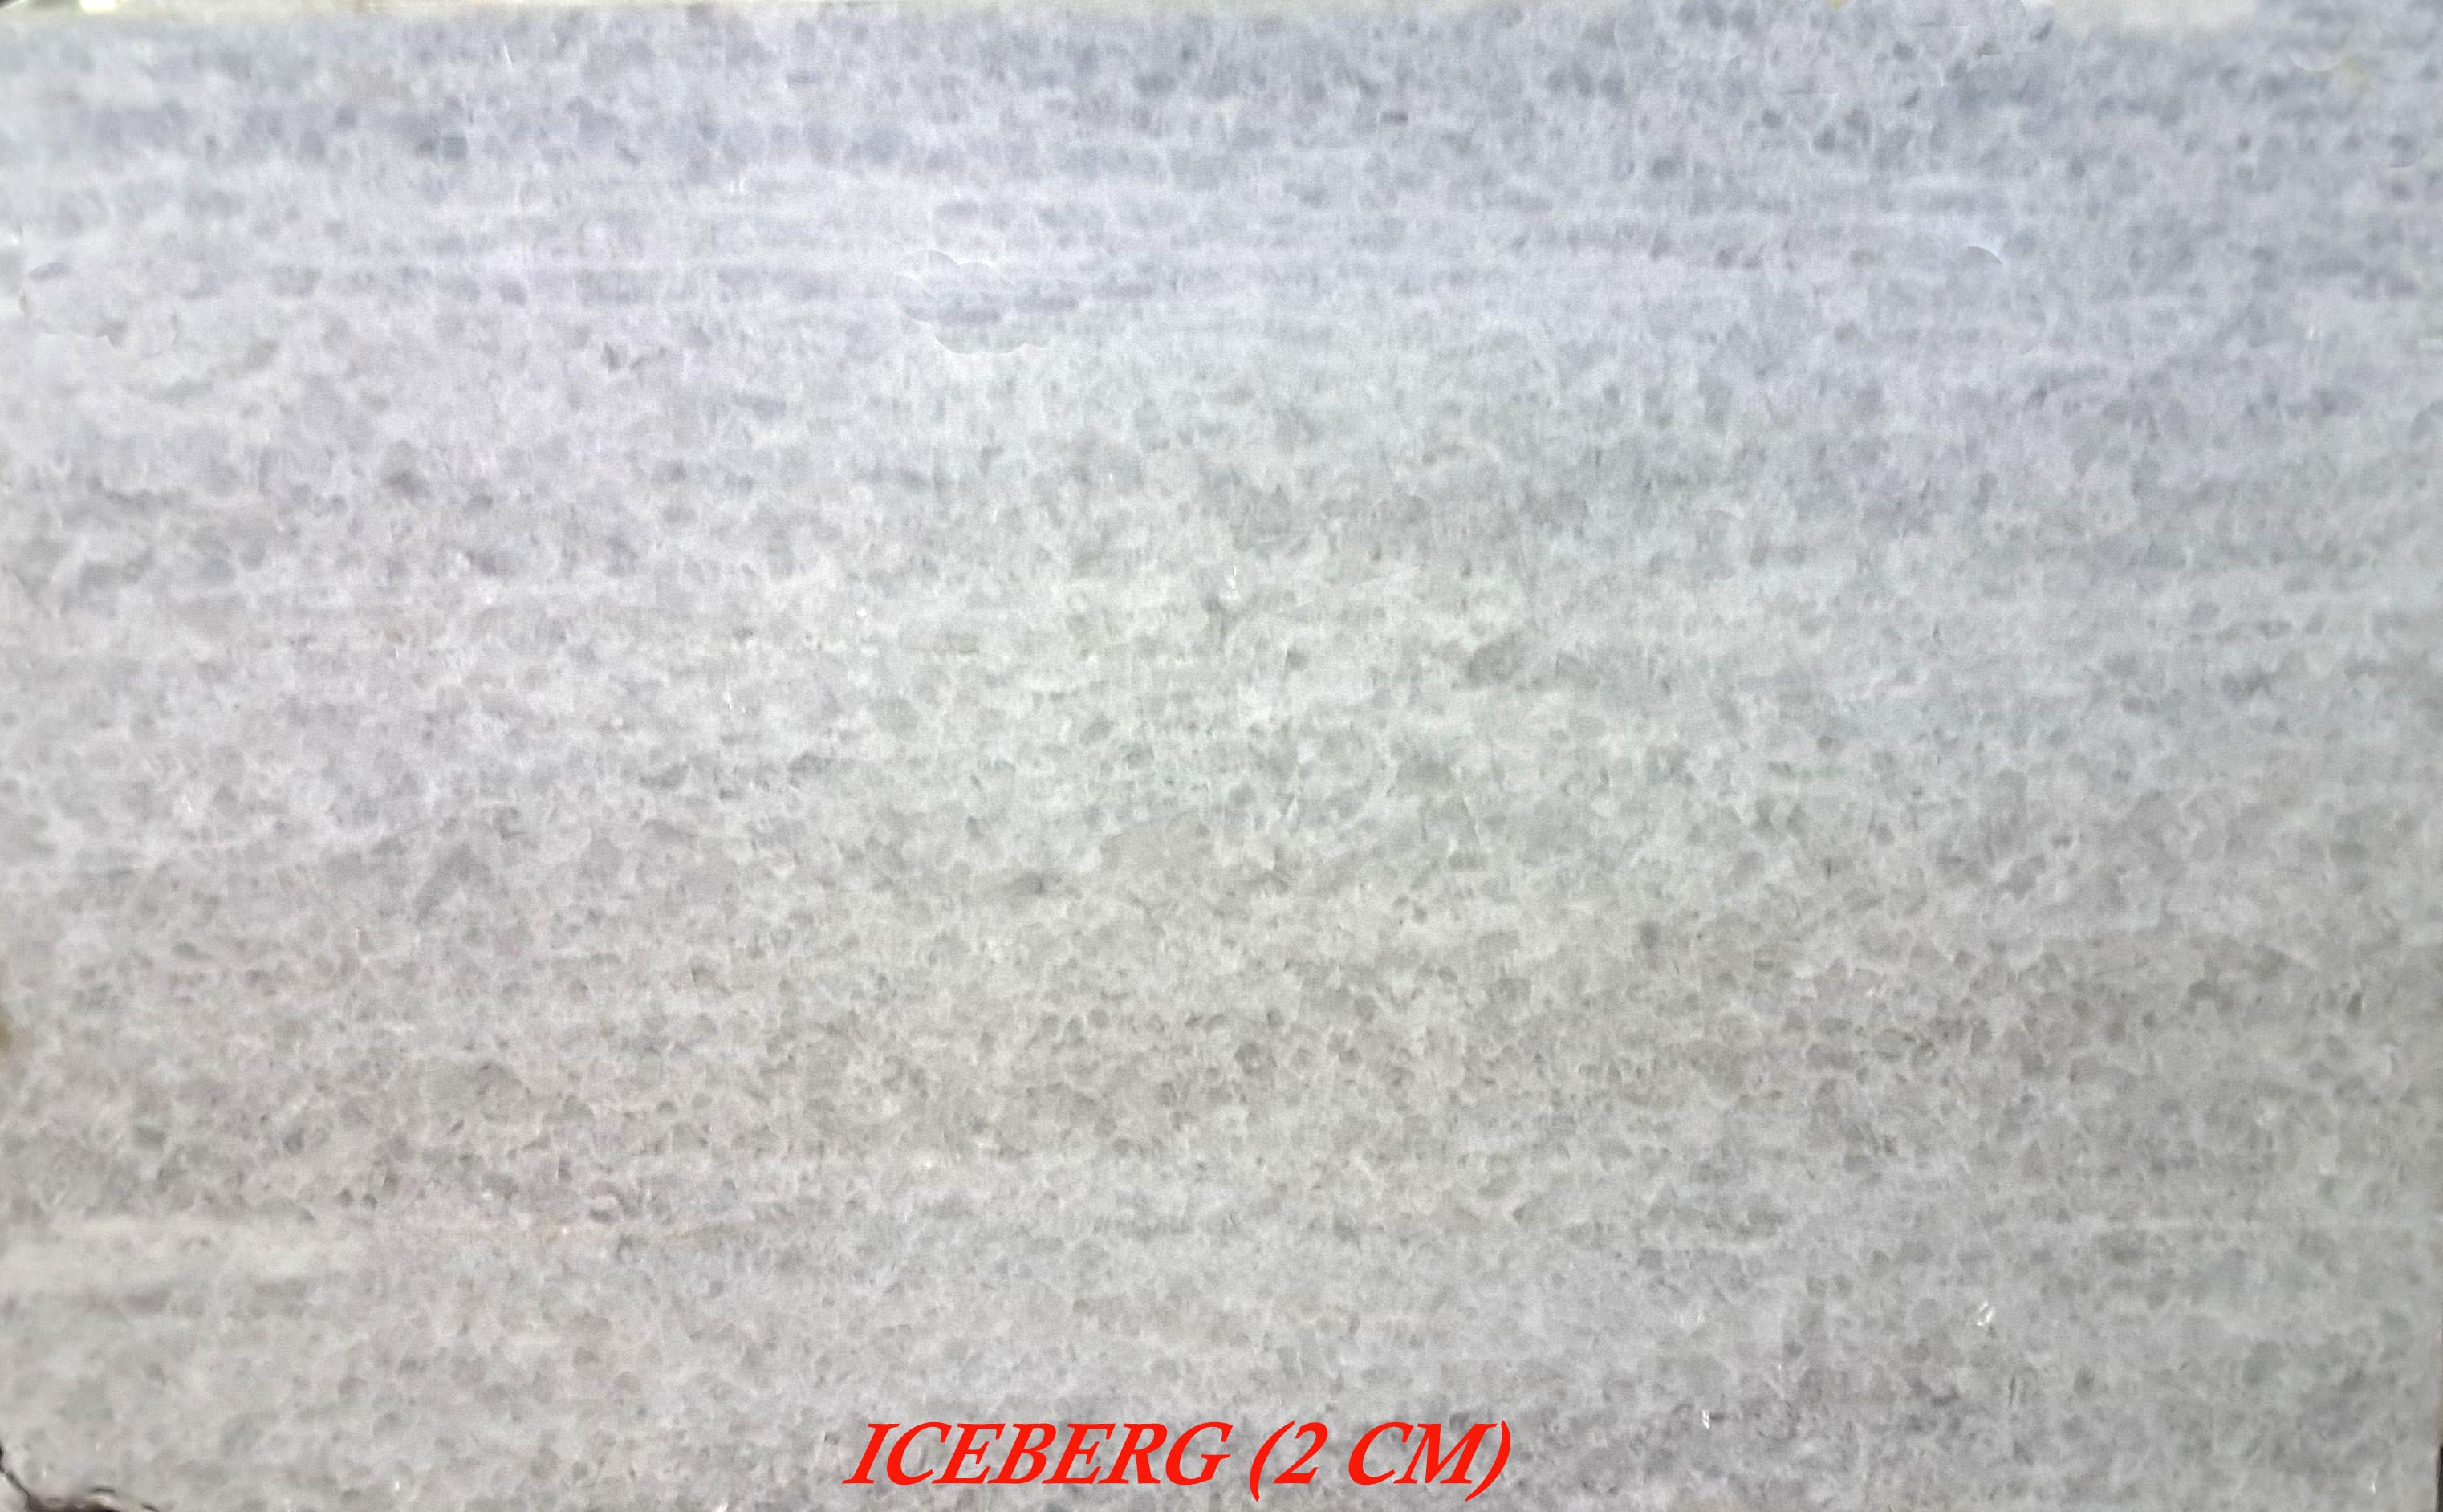 ICEBERG (2 CM)-#15730